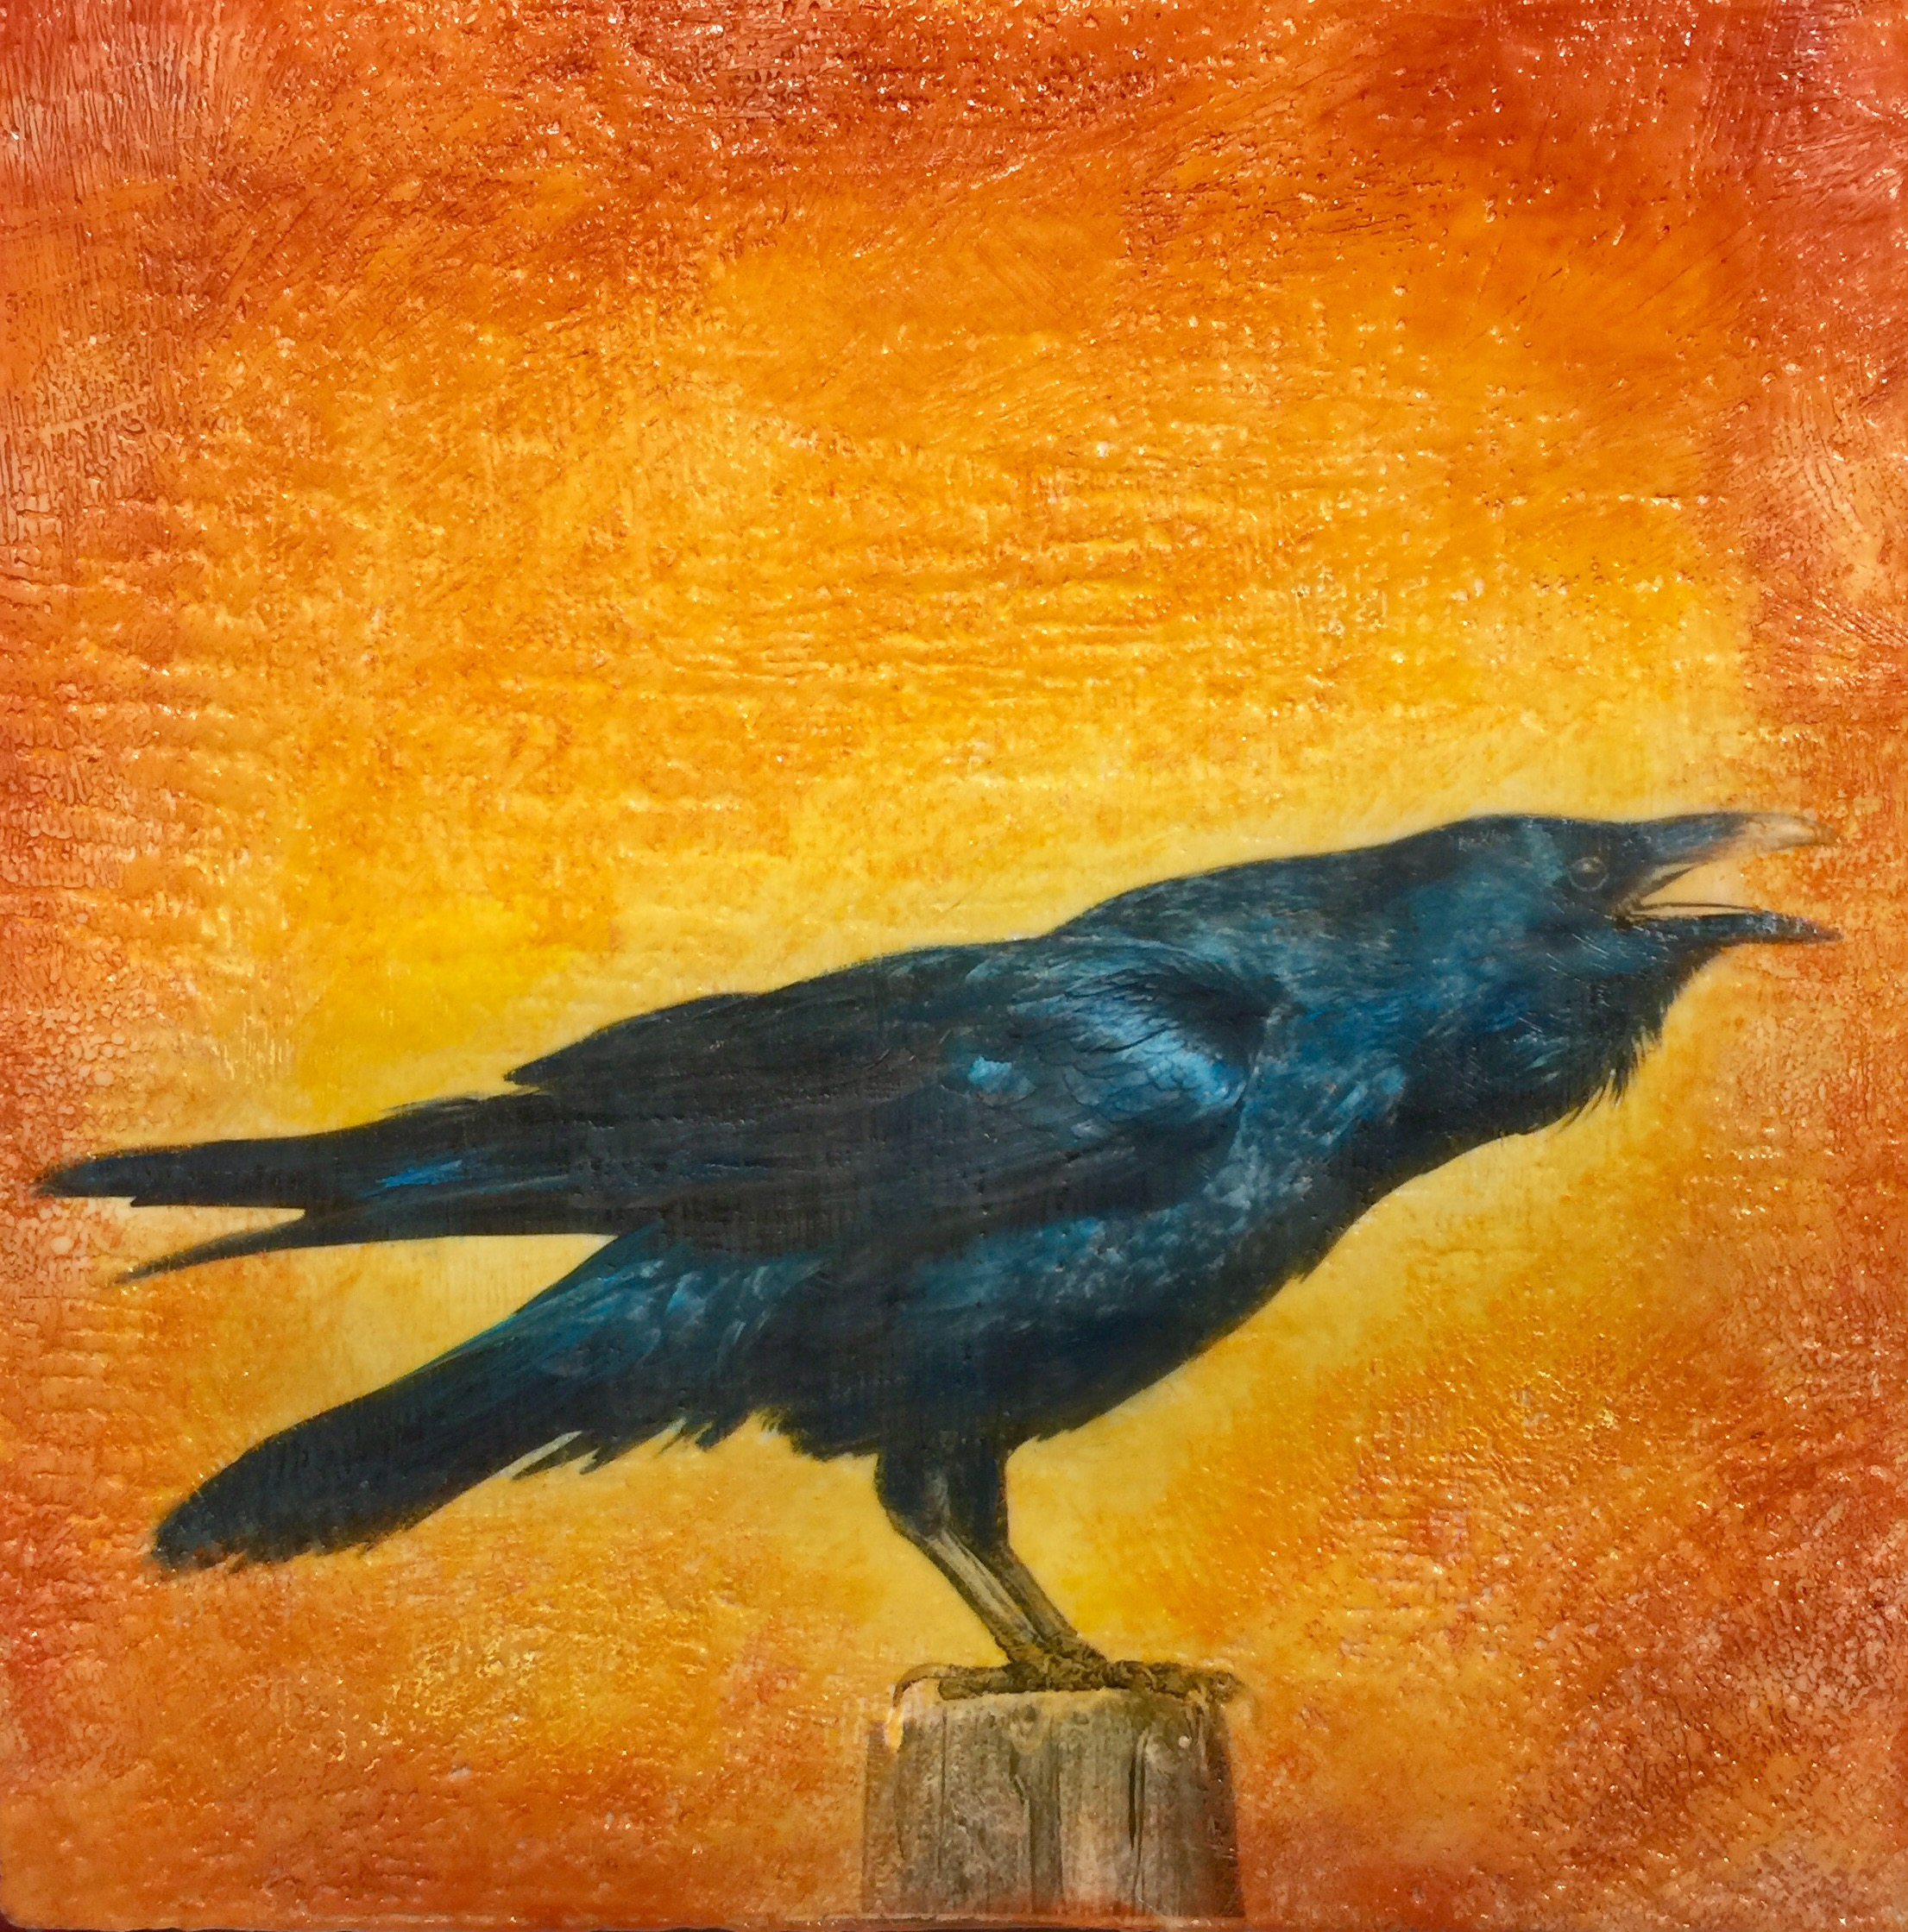 raven crow landing.jpg